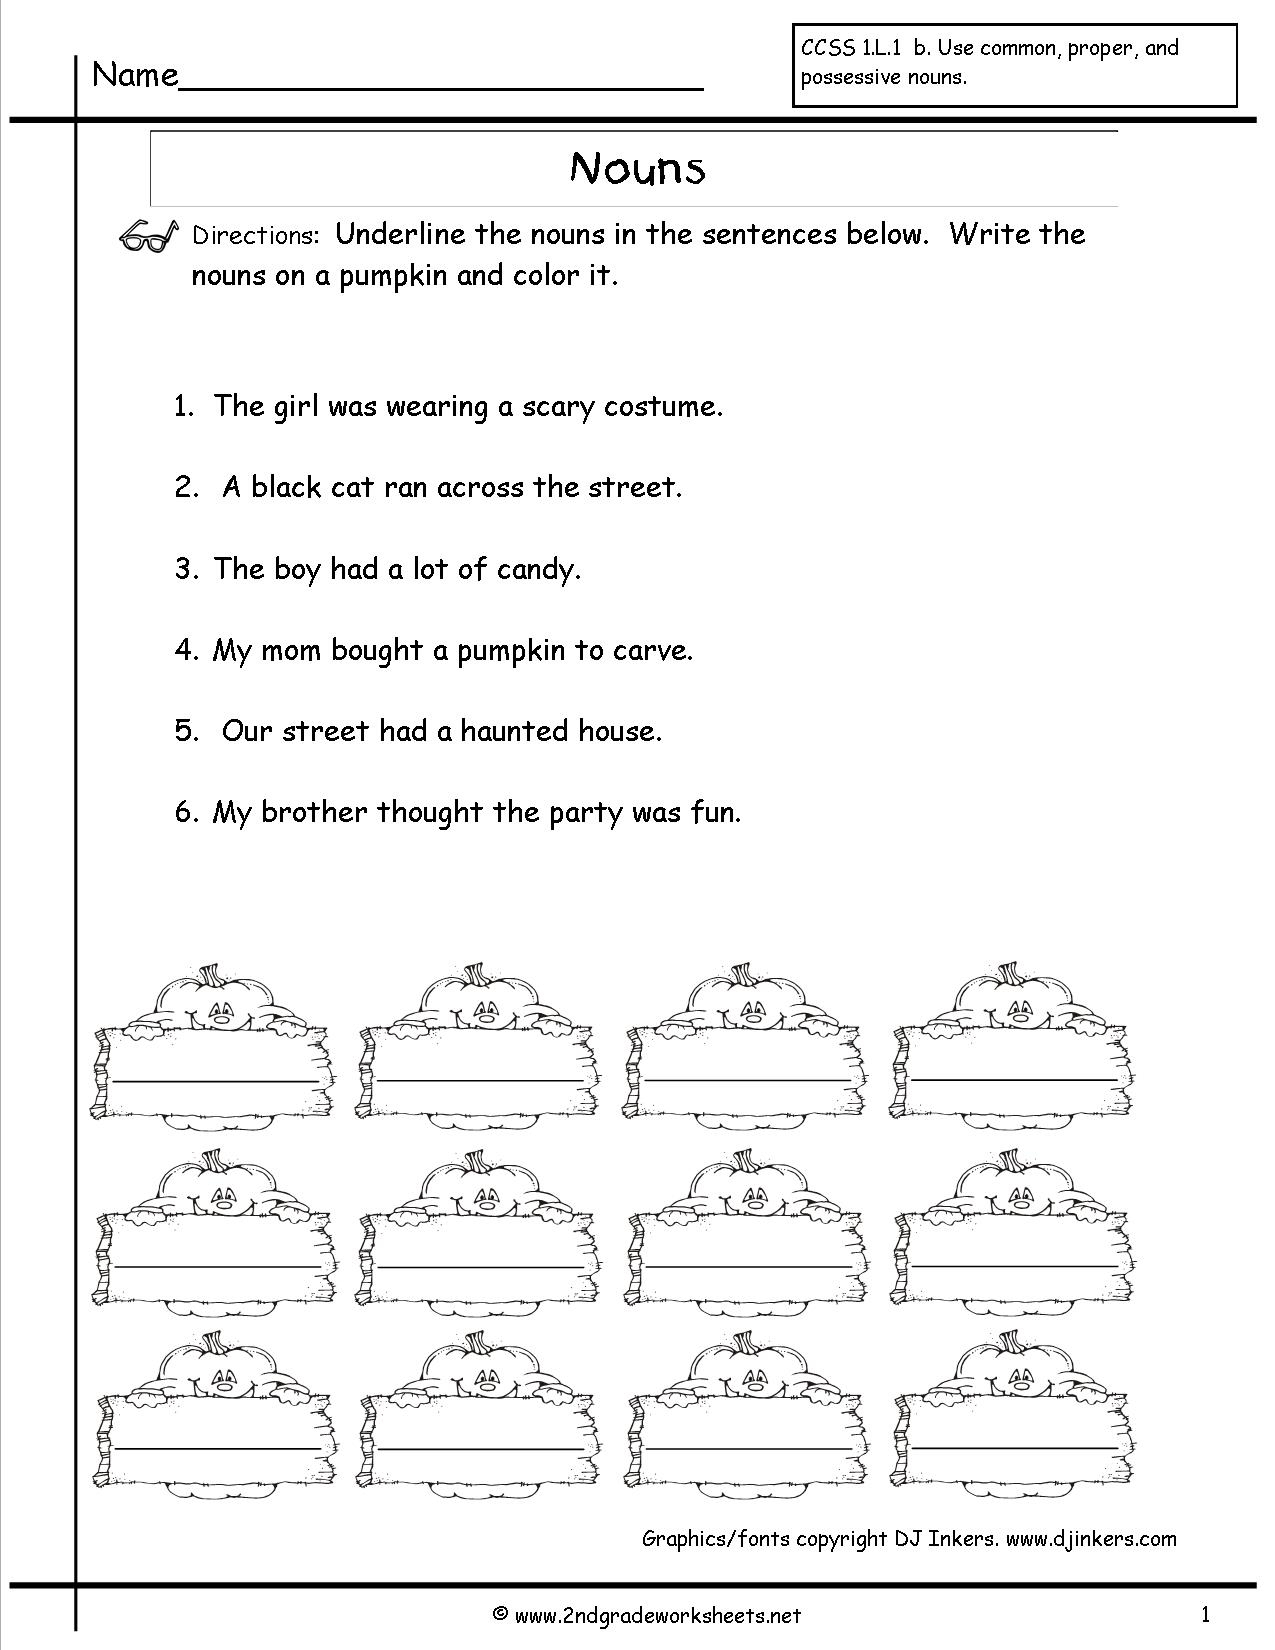 Nouns Worksheets And Printouts - Free Printable Verb Worksheets